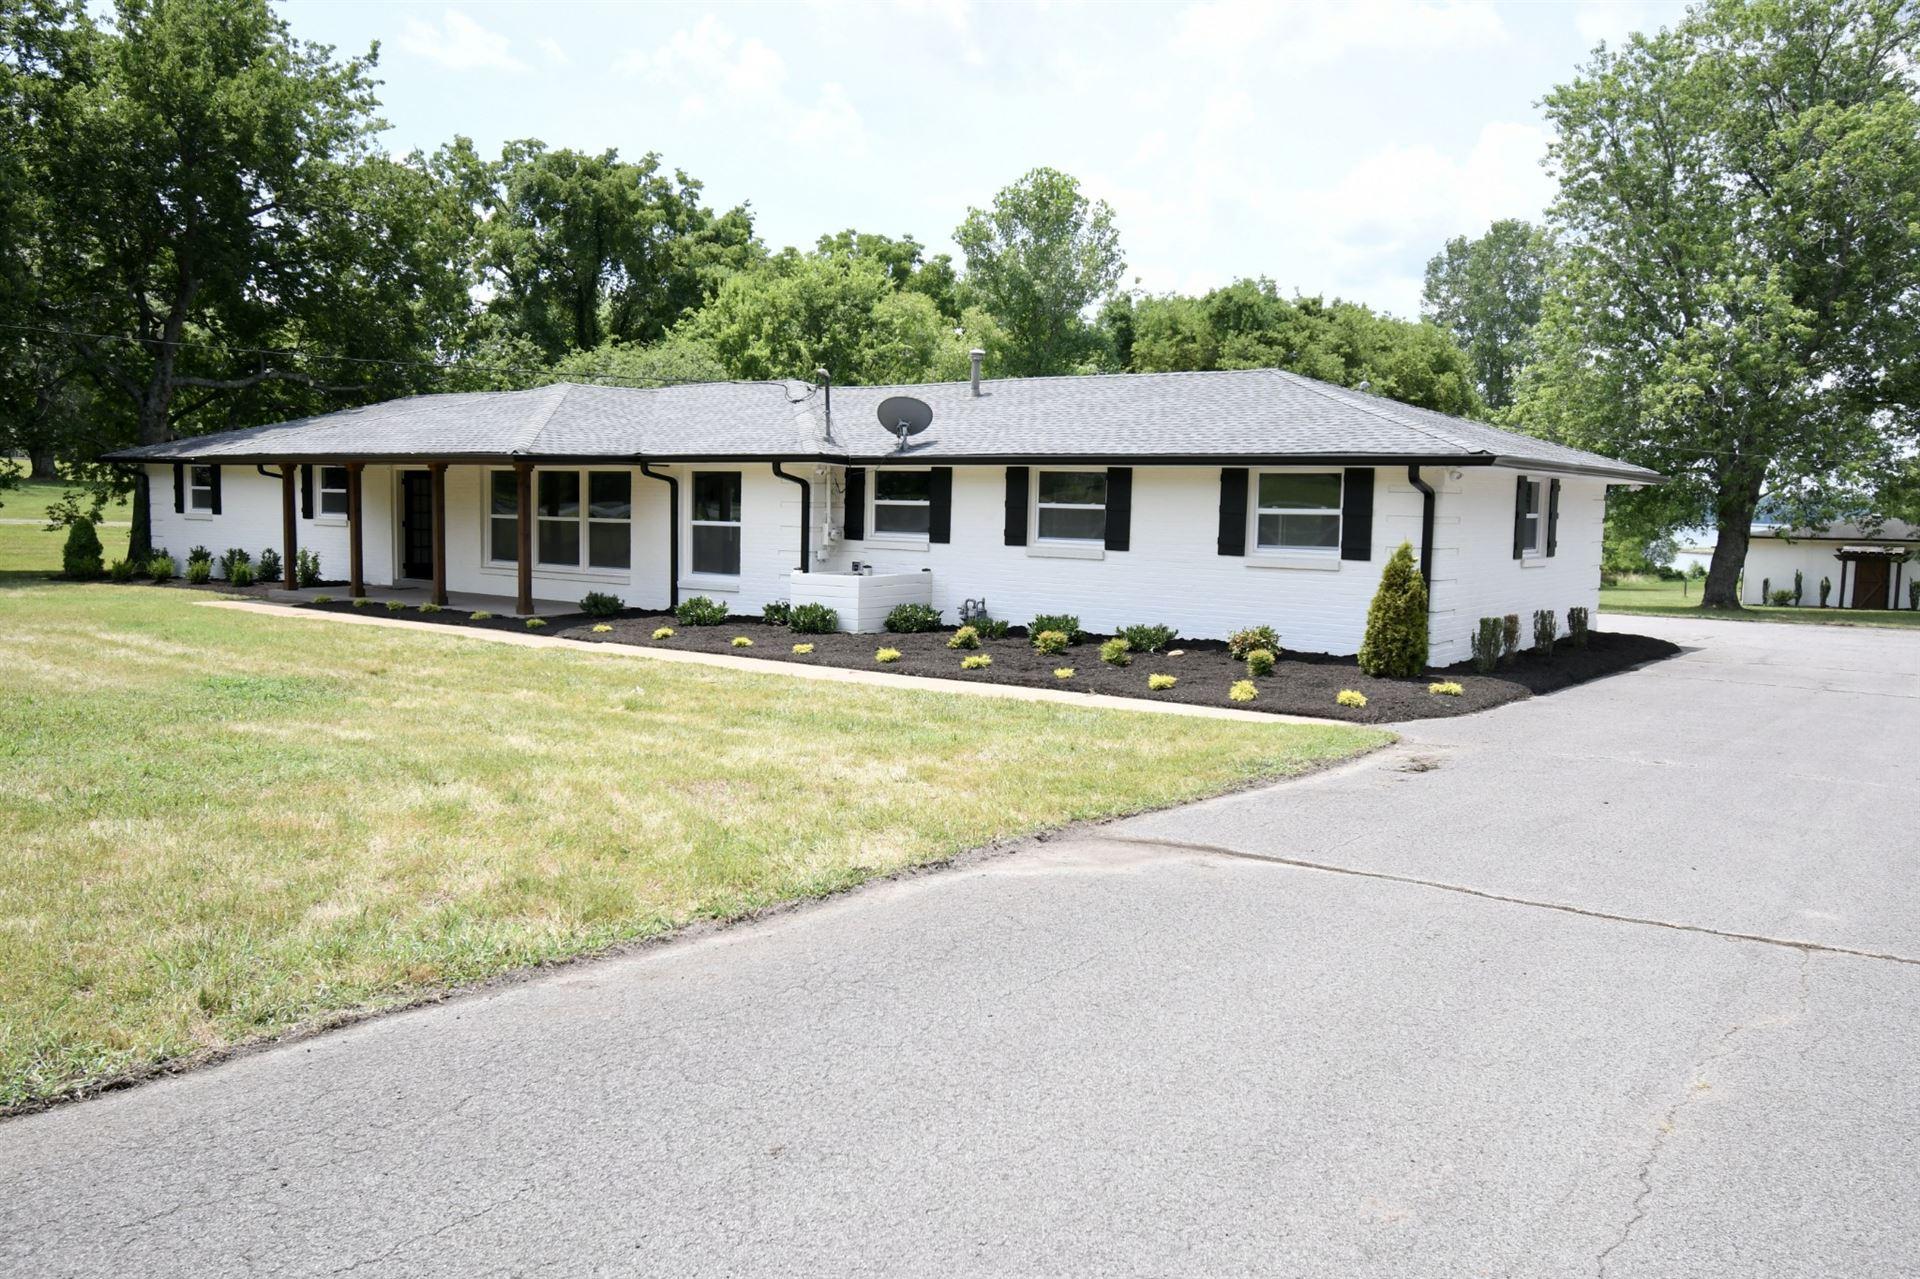 131 Cumberland Shores Dr, Hendersonville, TN 37075 - MLS#: 2272439